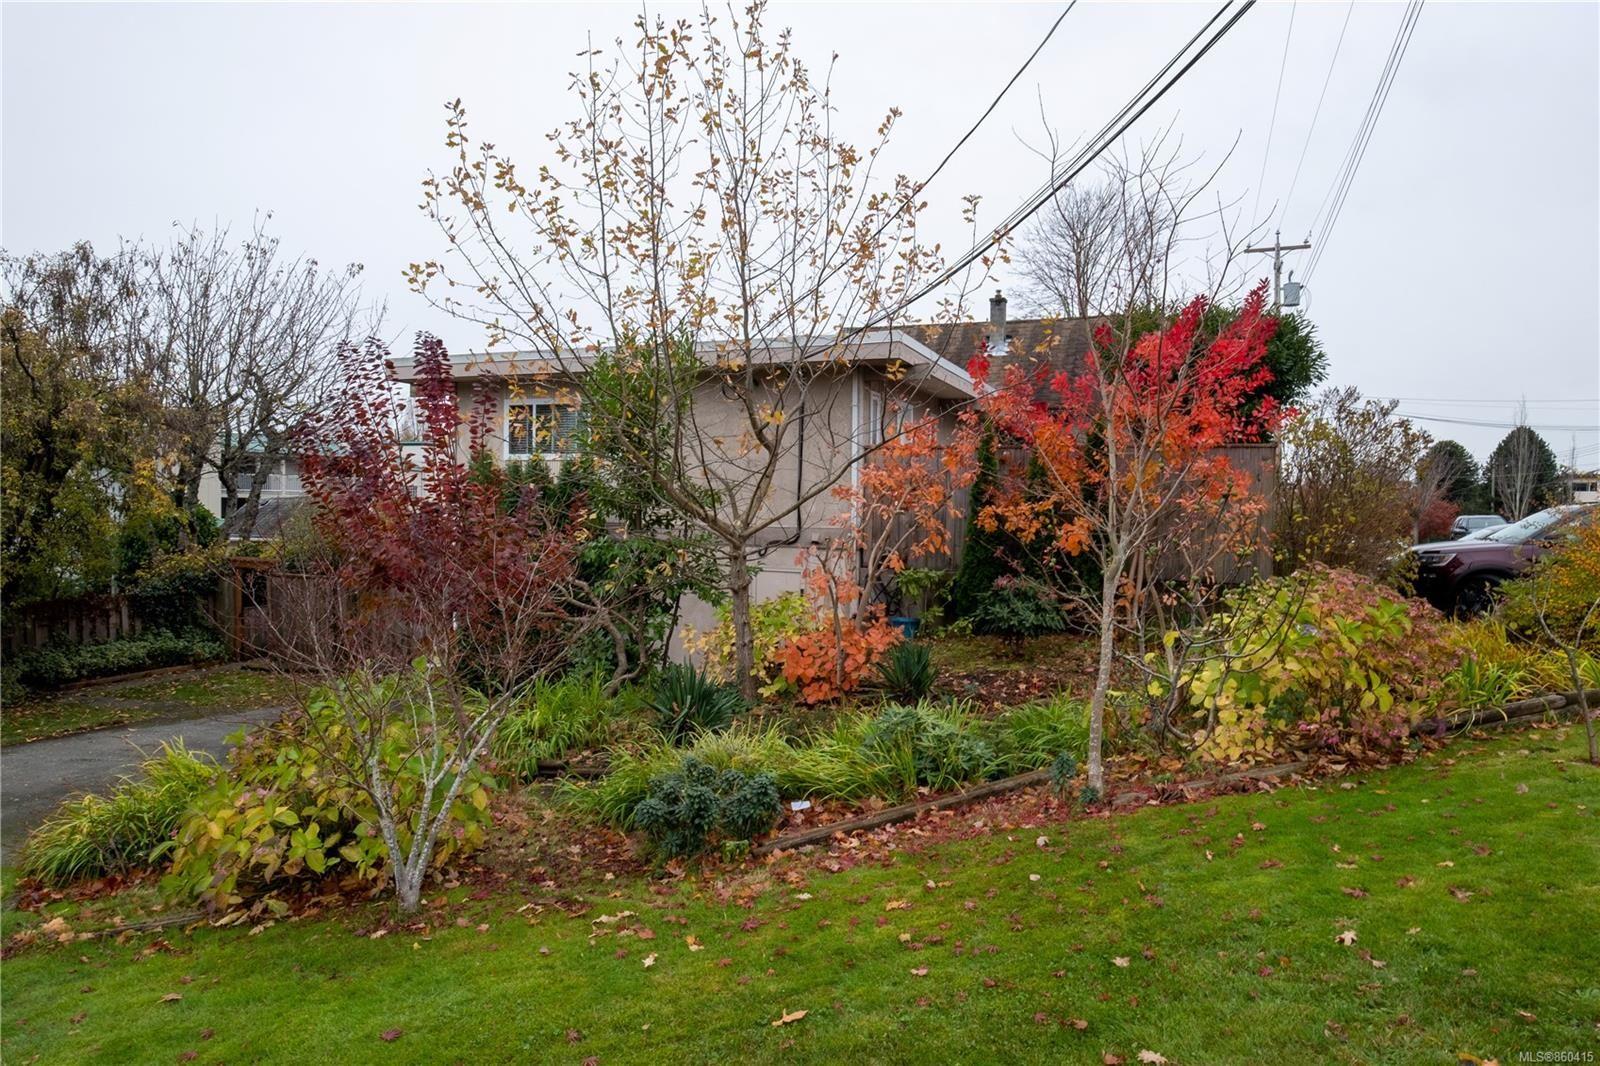 Main Photo: 181 Rosehill St in : Na Brechin Hill Quadruplex for sale (Nanaimo)  : MLS®# 860415